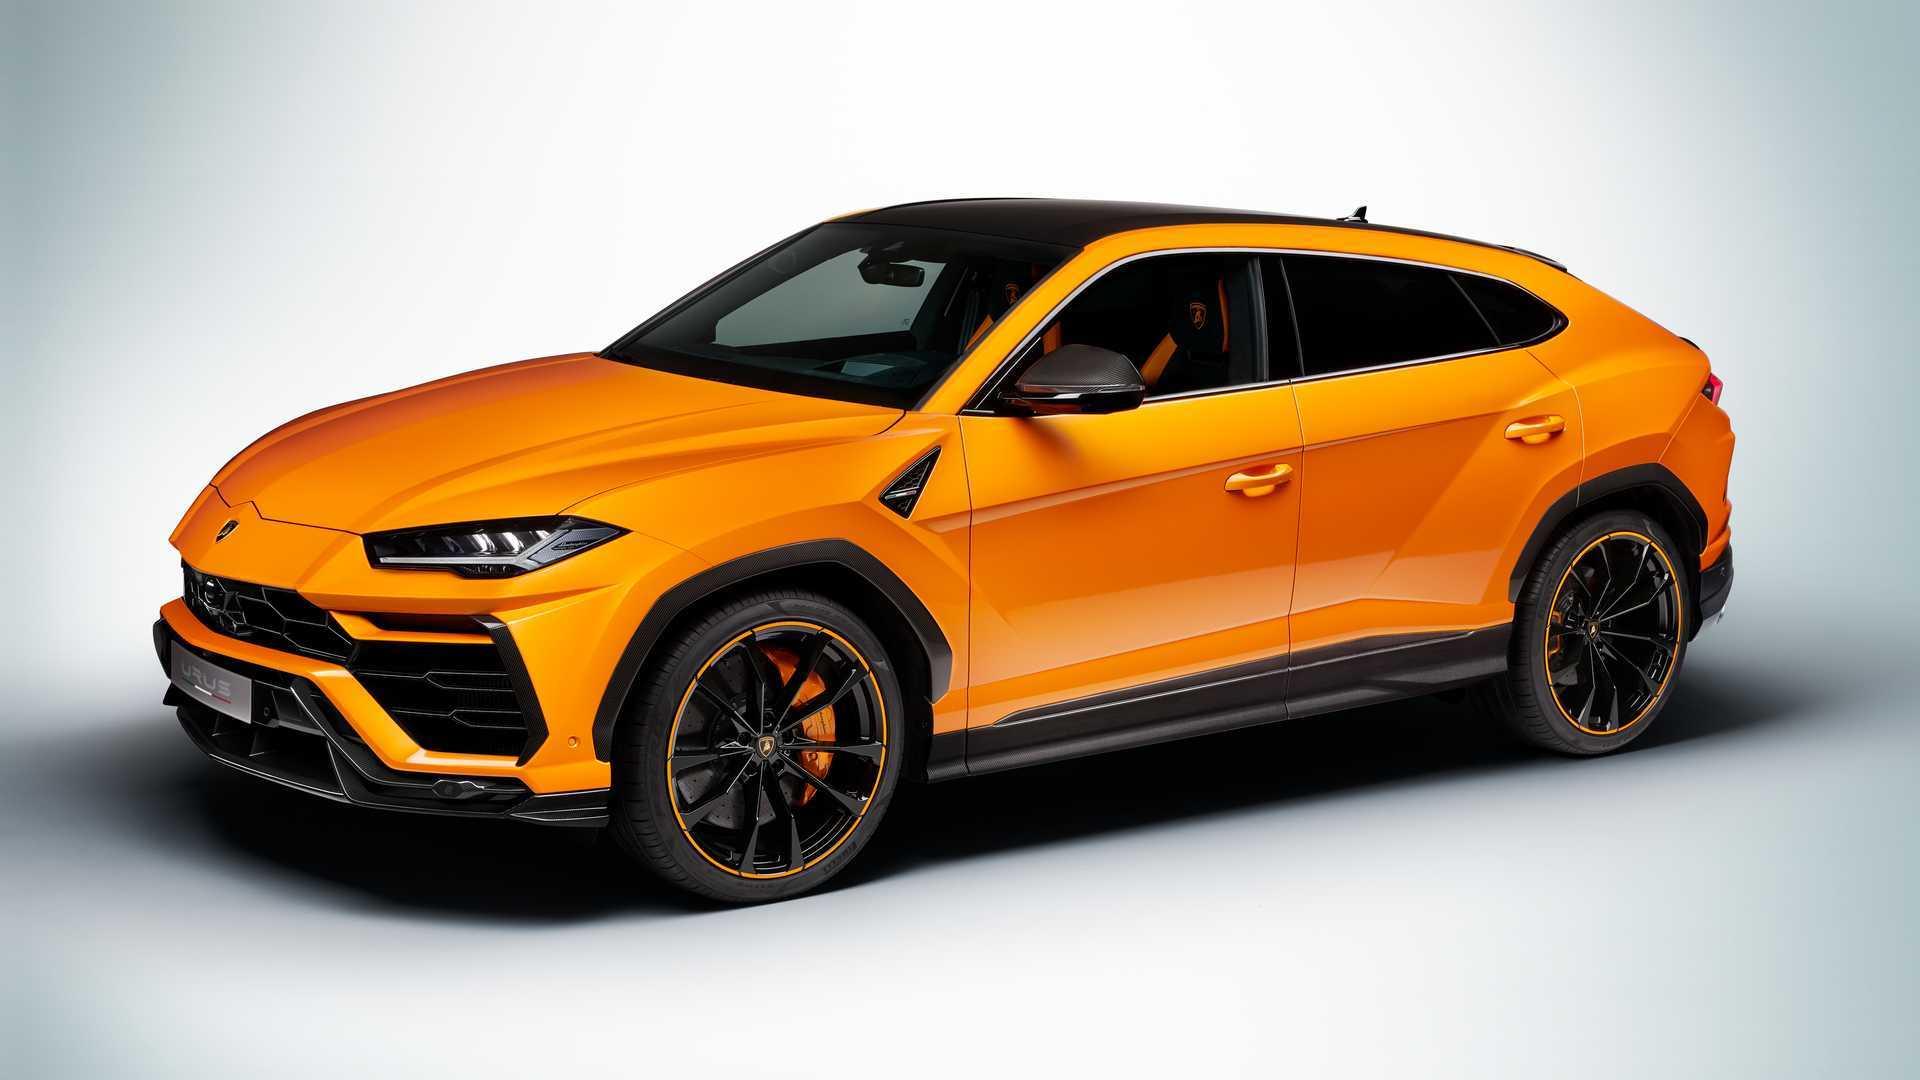 2018 - [Lamborghini] SUV Urus [LB 736] - Page 11 Urus